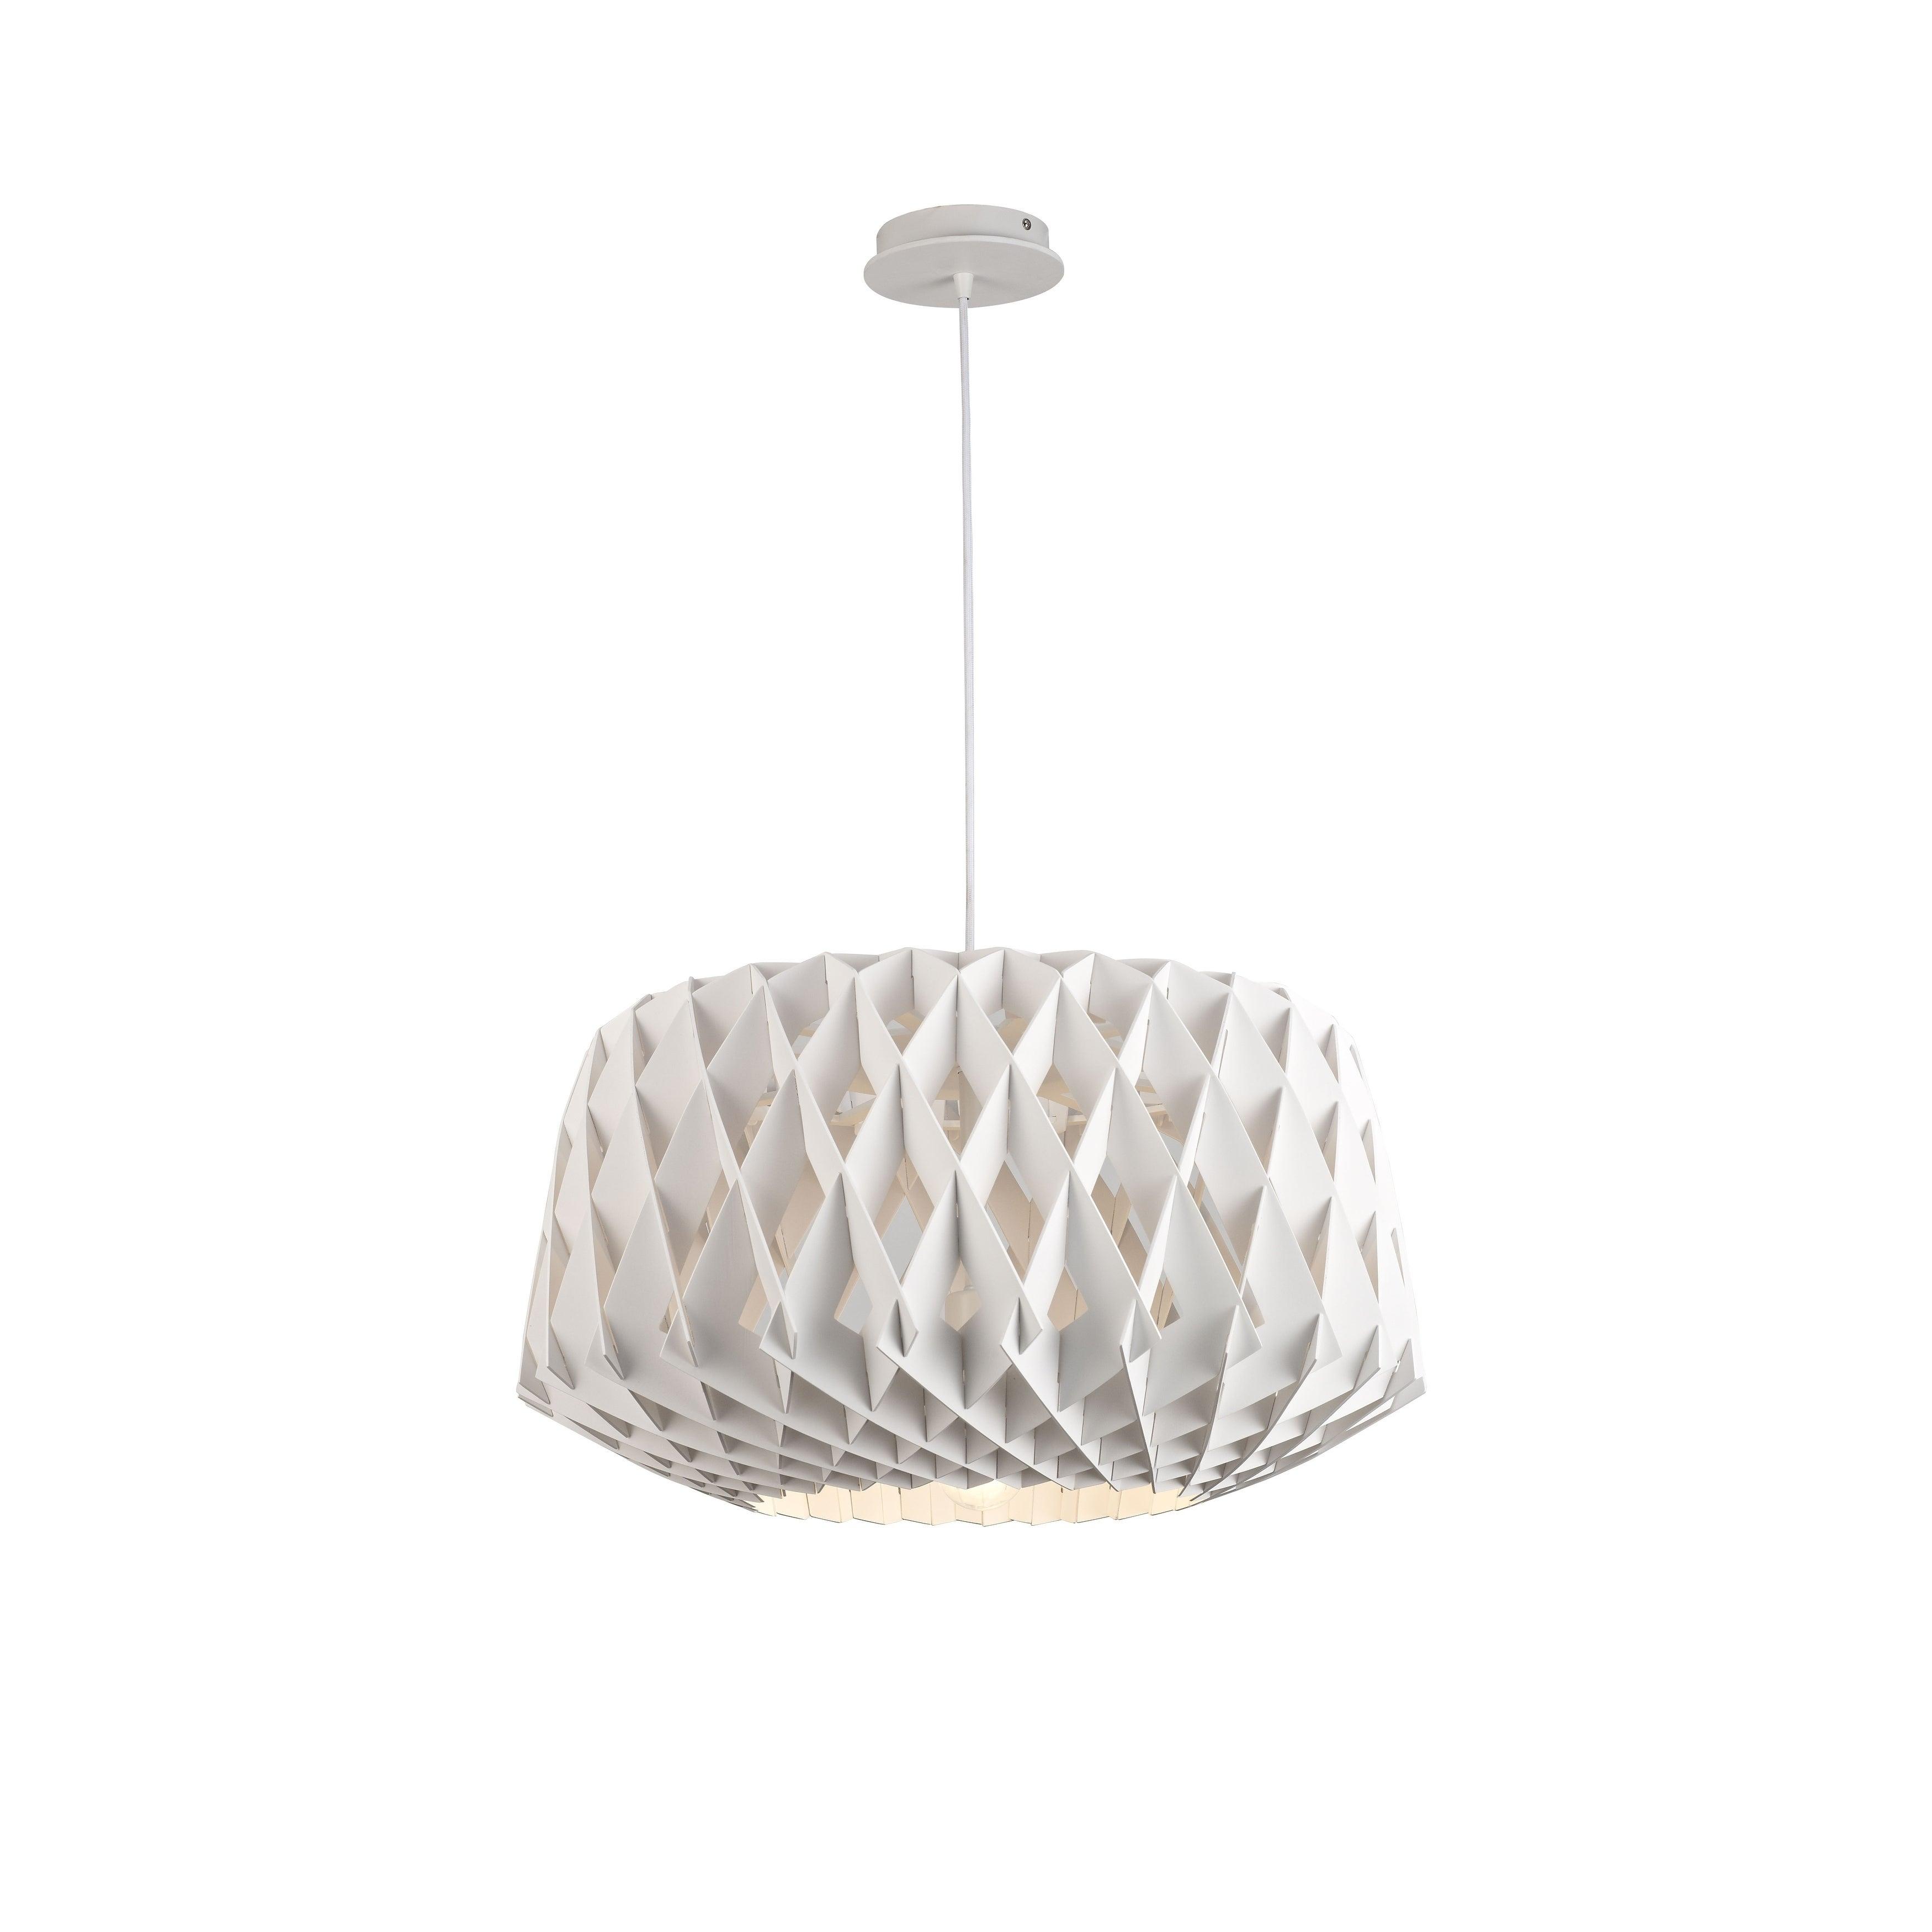 "Gabriella 22"" Pendant Lamp Within Gabriella 3 Light Lantern Chandeliers (View 16 of 30)"